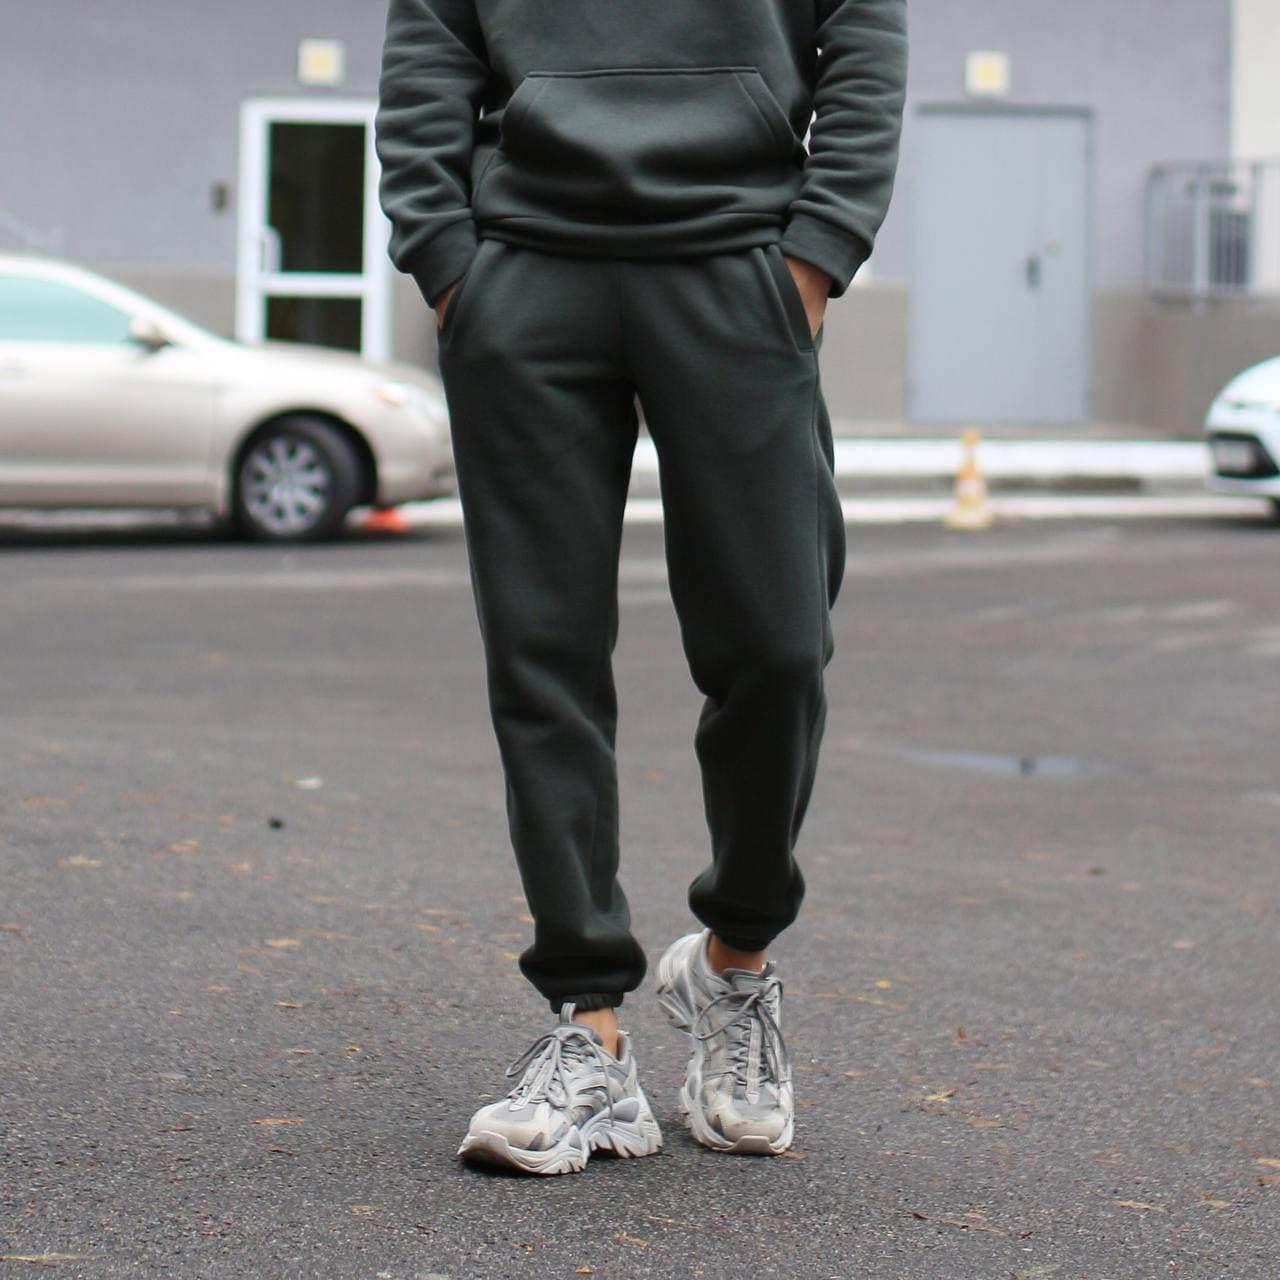 Спортивные штаны мужские в цвете хаки База от бренда ТУР,размер: XS, S, M, L, XL